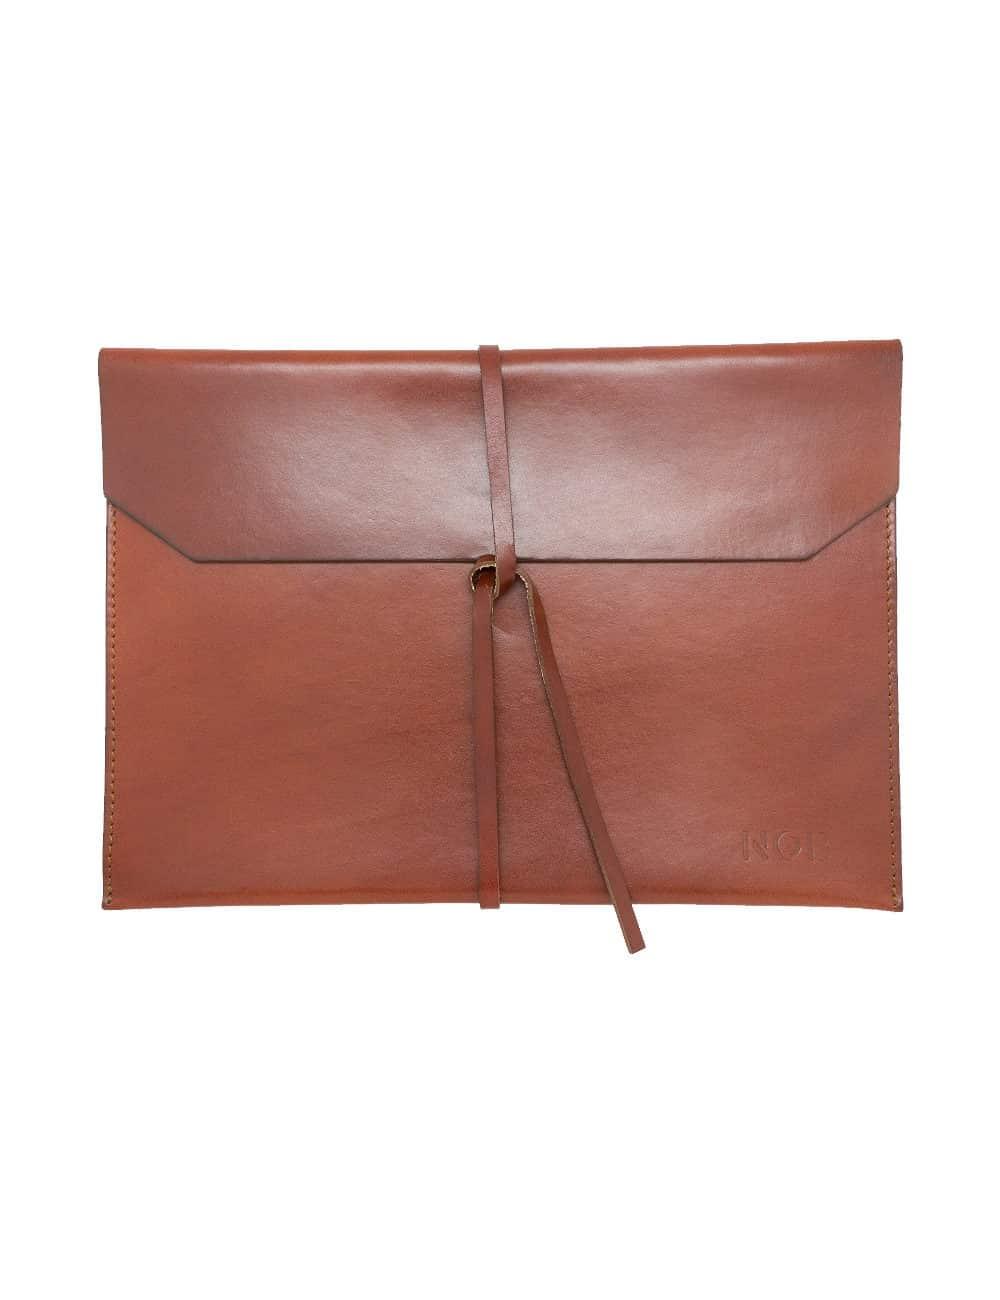 Dark Brown 100% Genuine Top Grain Leather Tablet & Notebook Folder SG16.NOB1